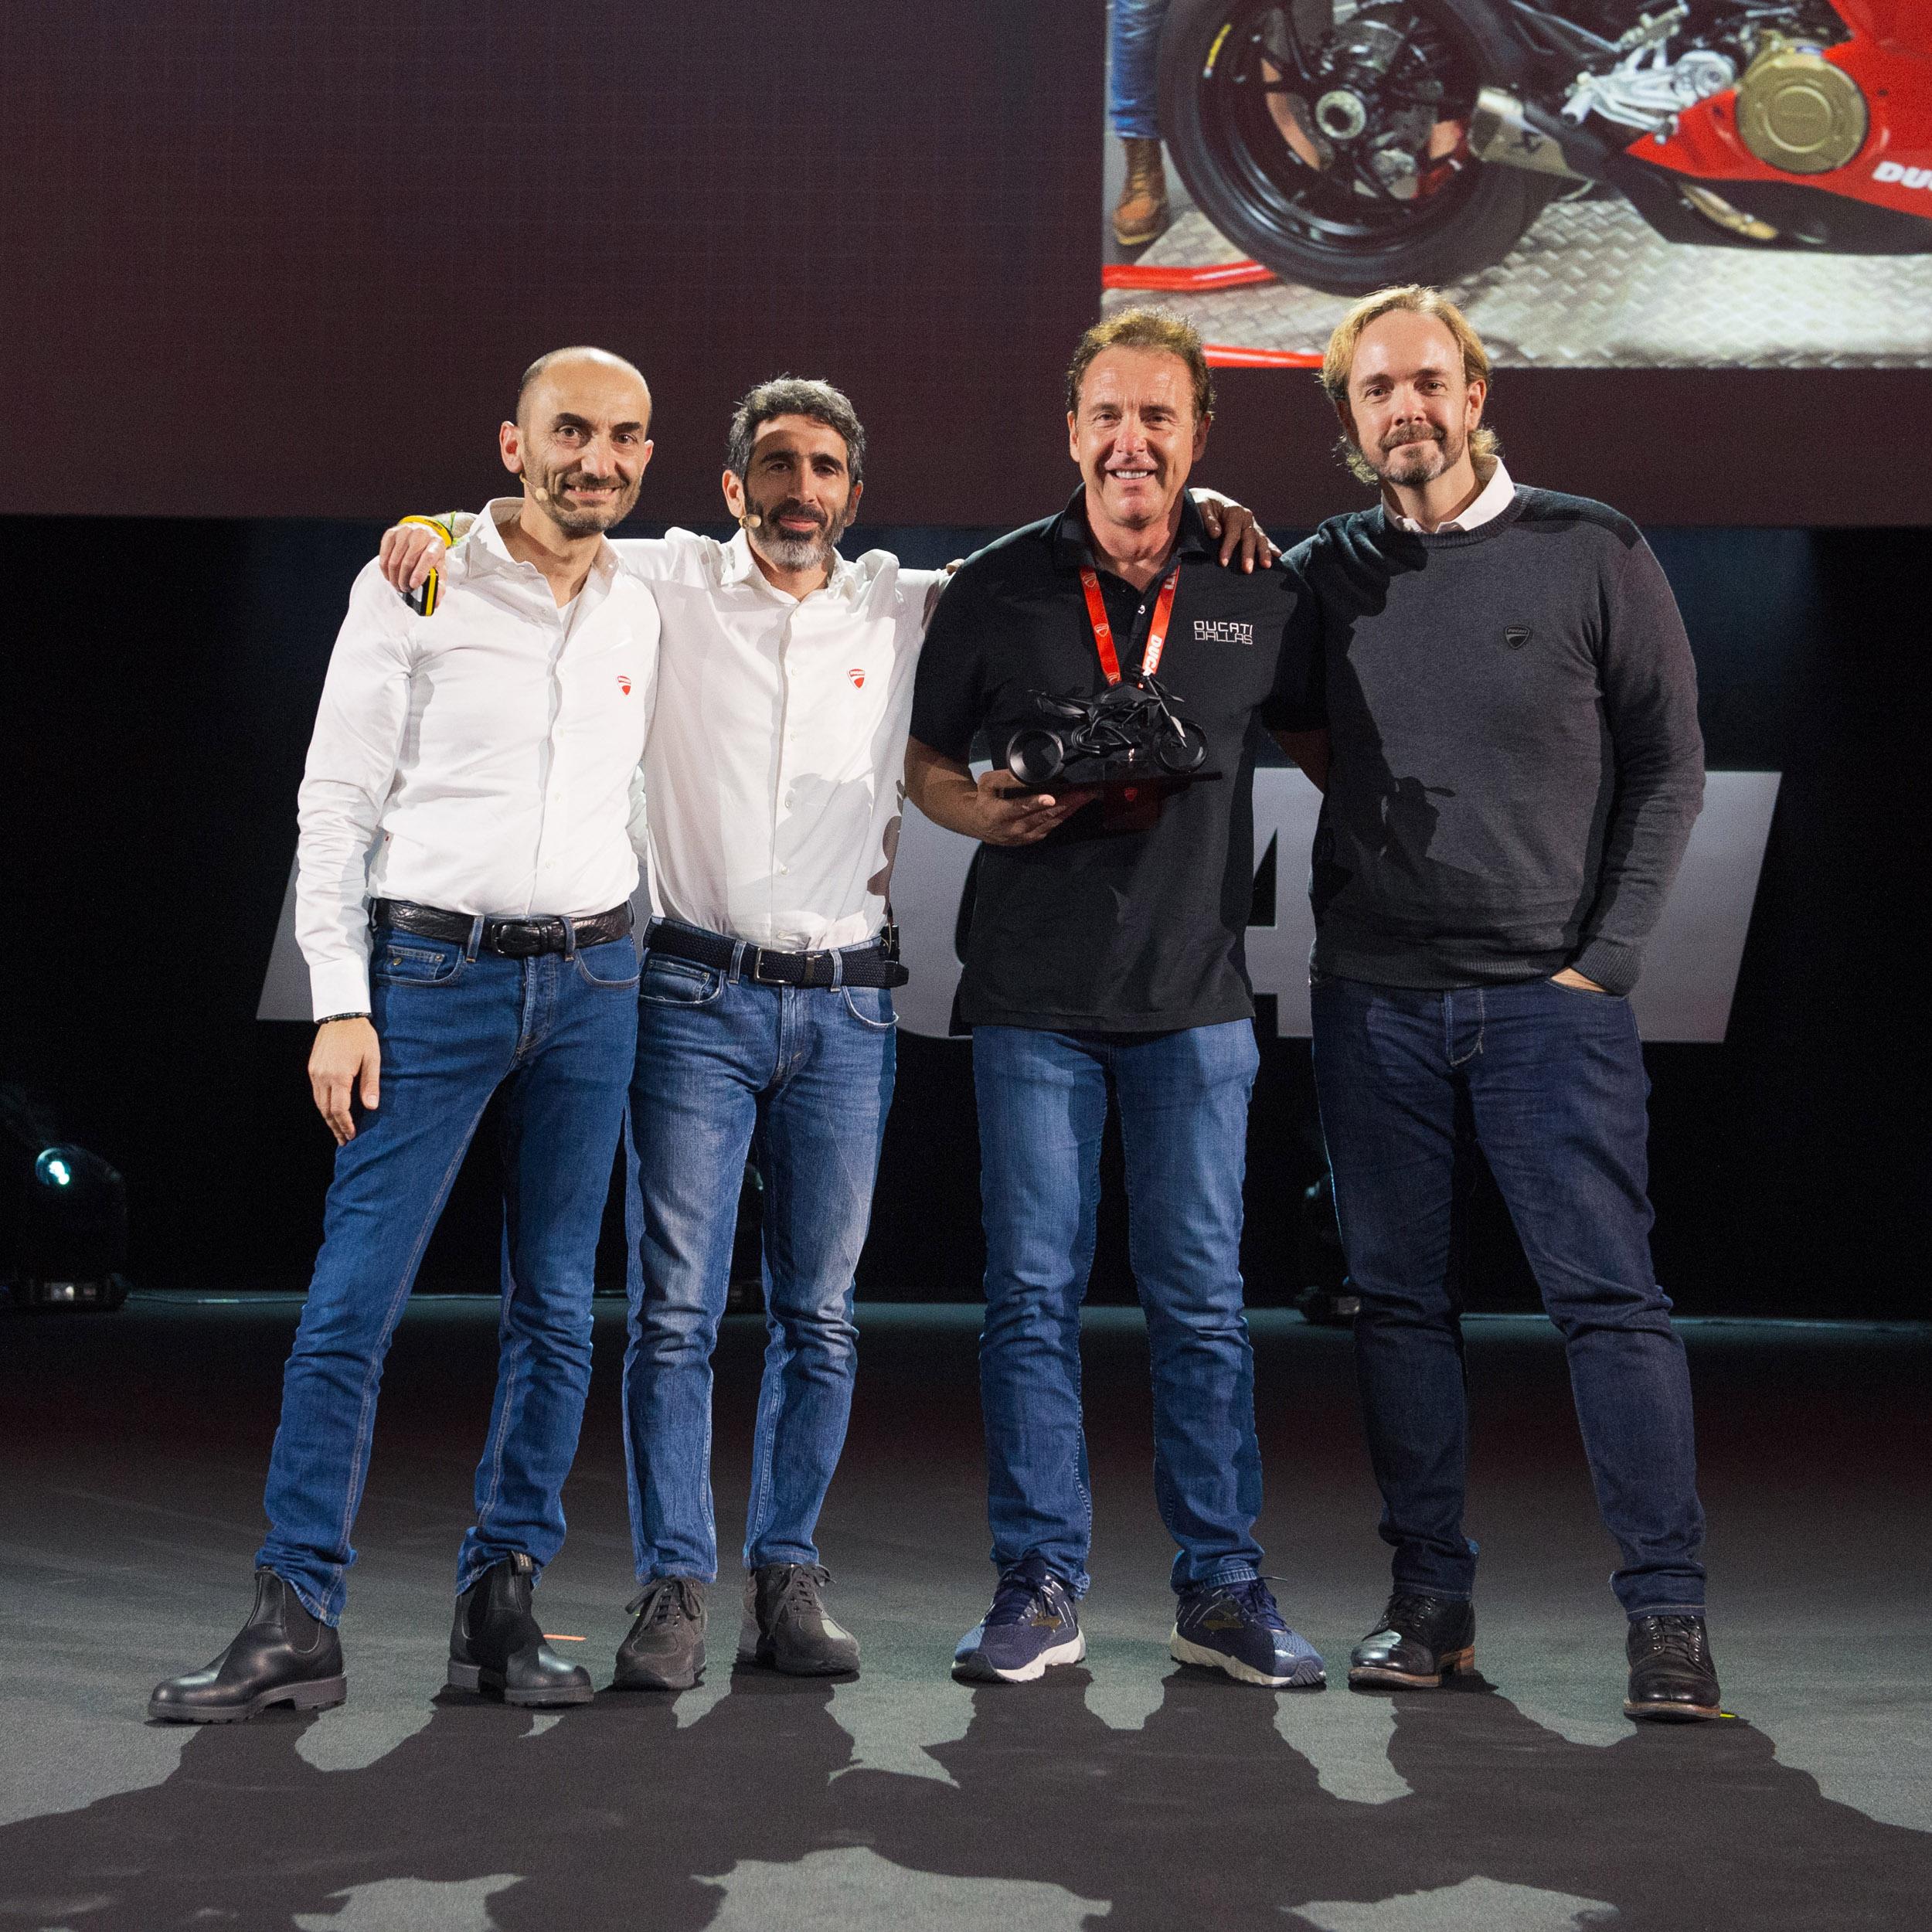 C. Domenicali, F. Milicia (VP Global Sales & After Sales DMH), J. Nash (Ducati Dallas President), J. Chinnock